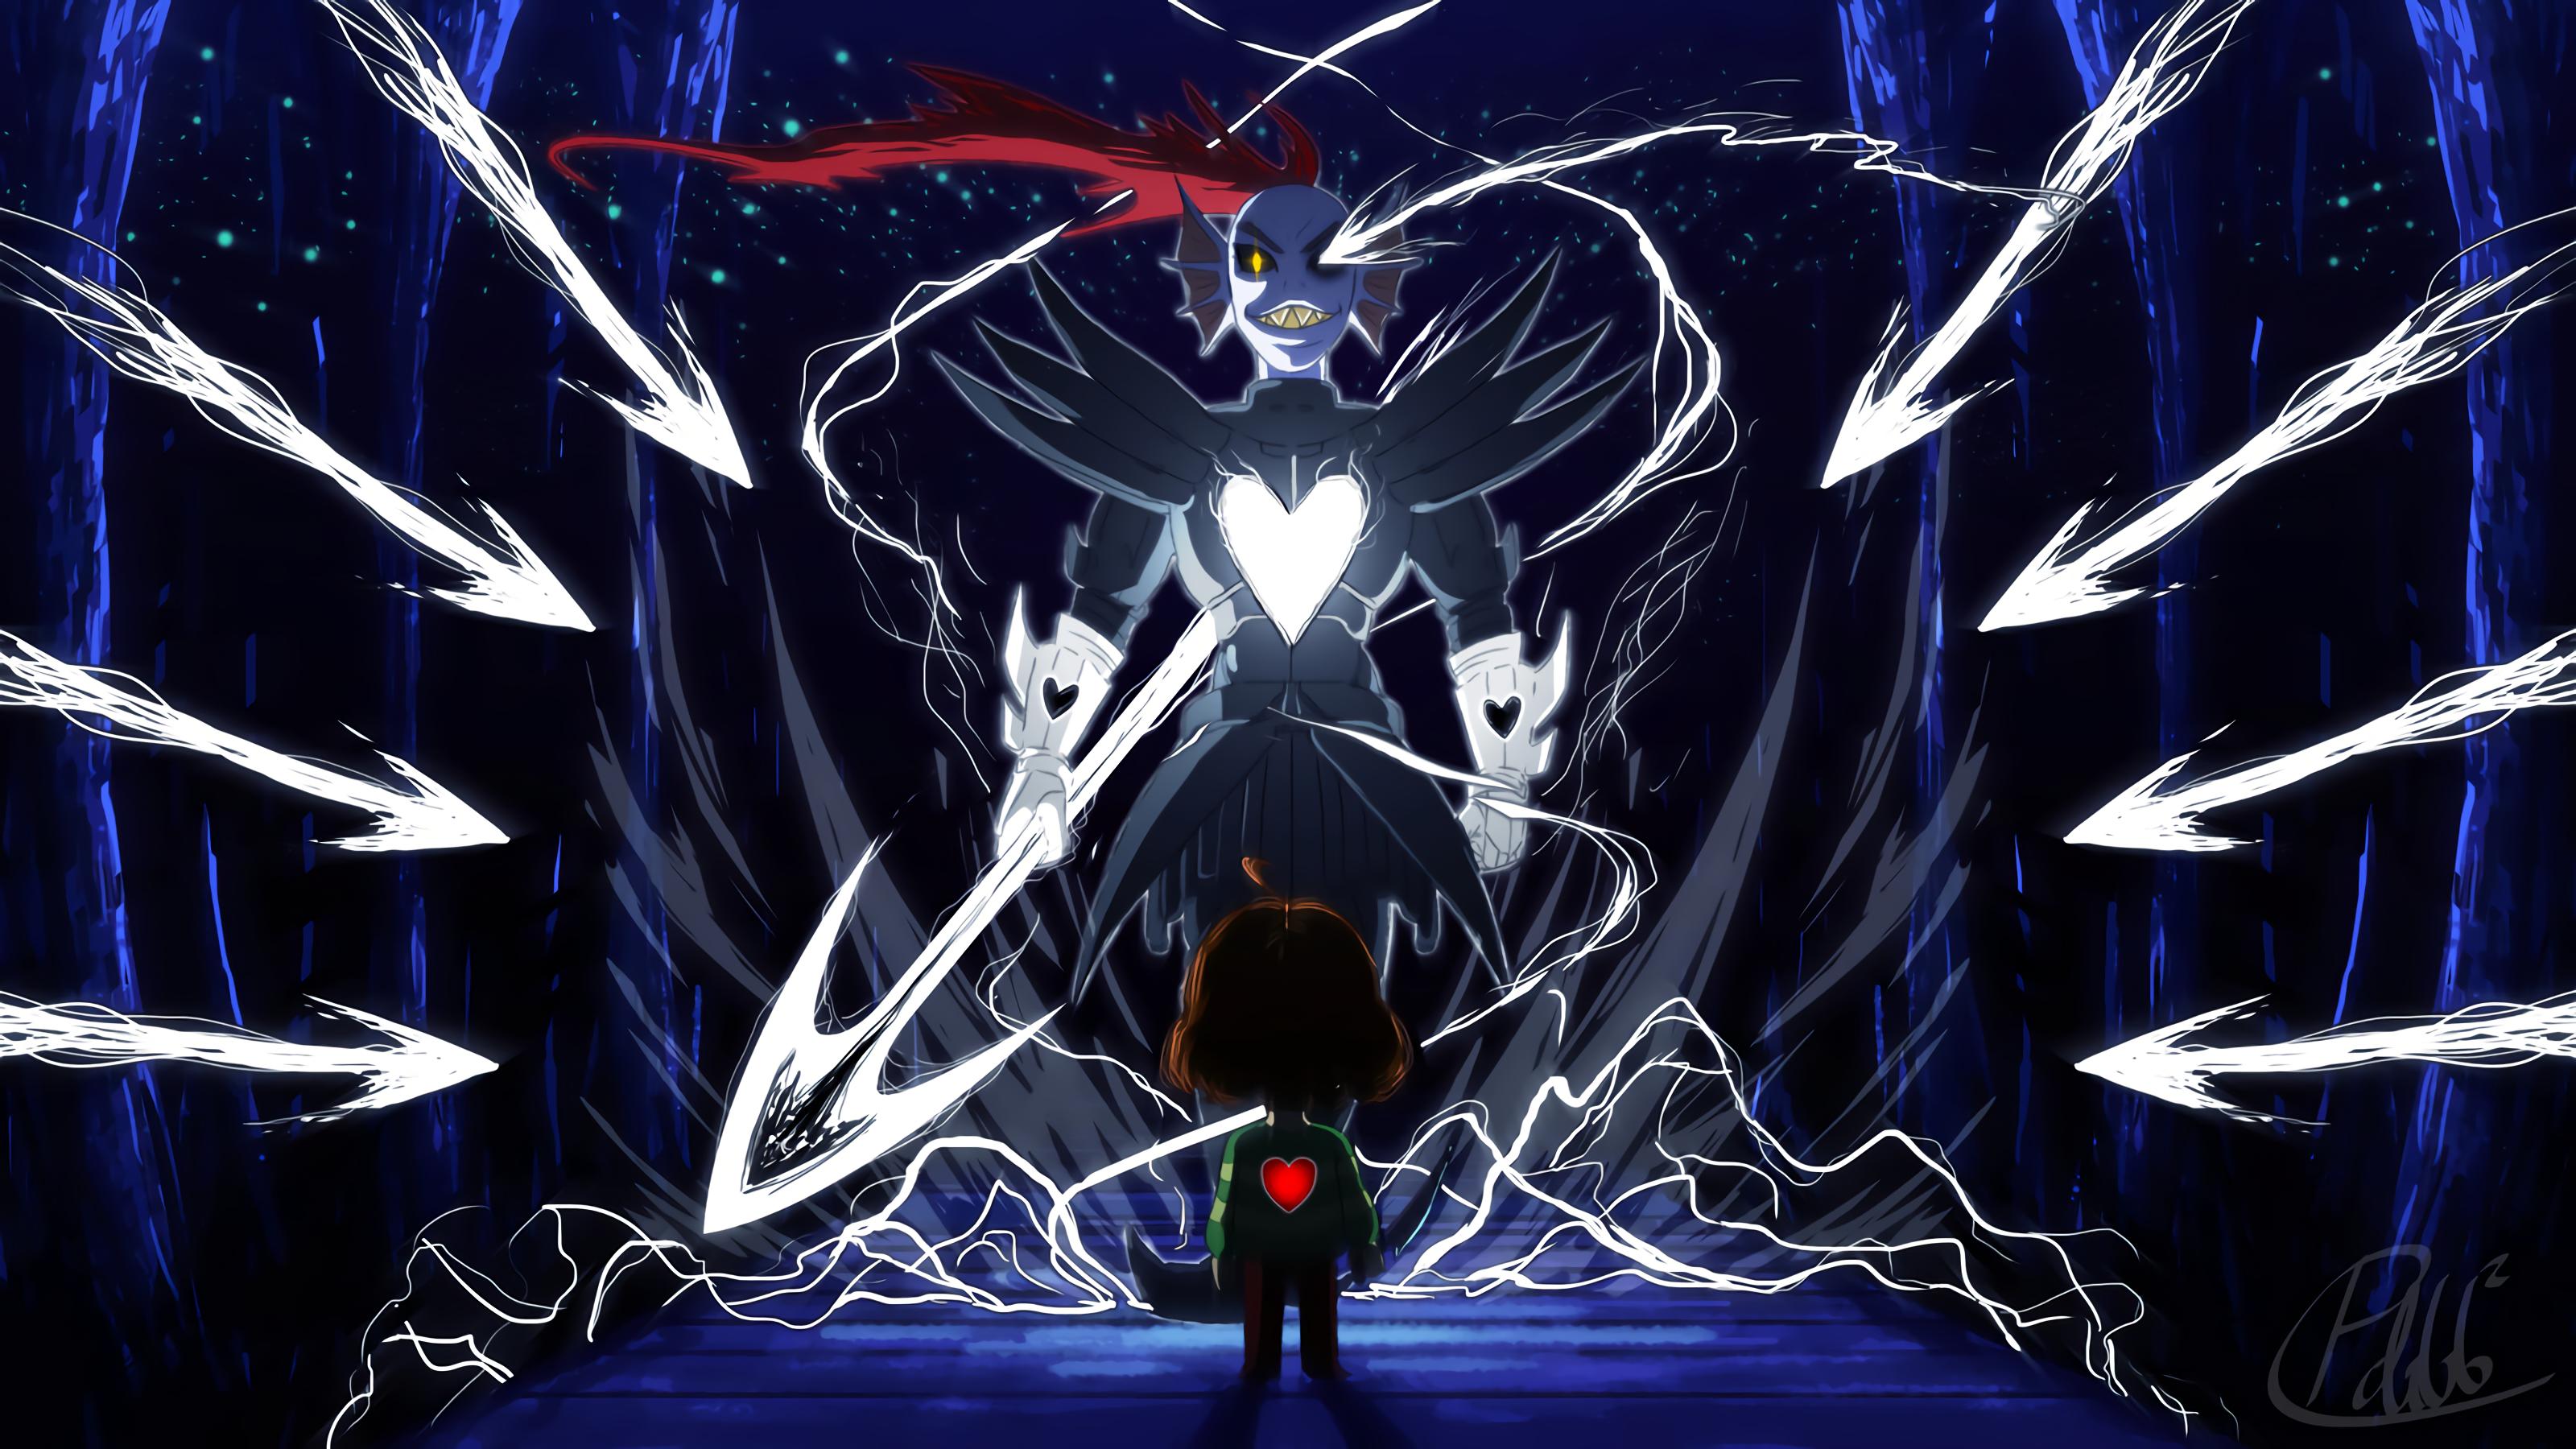 Battle Against A True Hero Full HD Wallpaper and